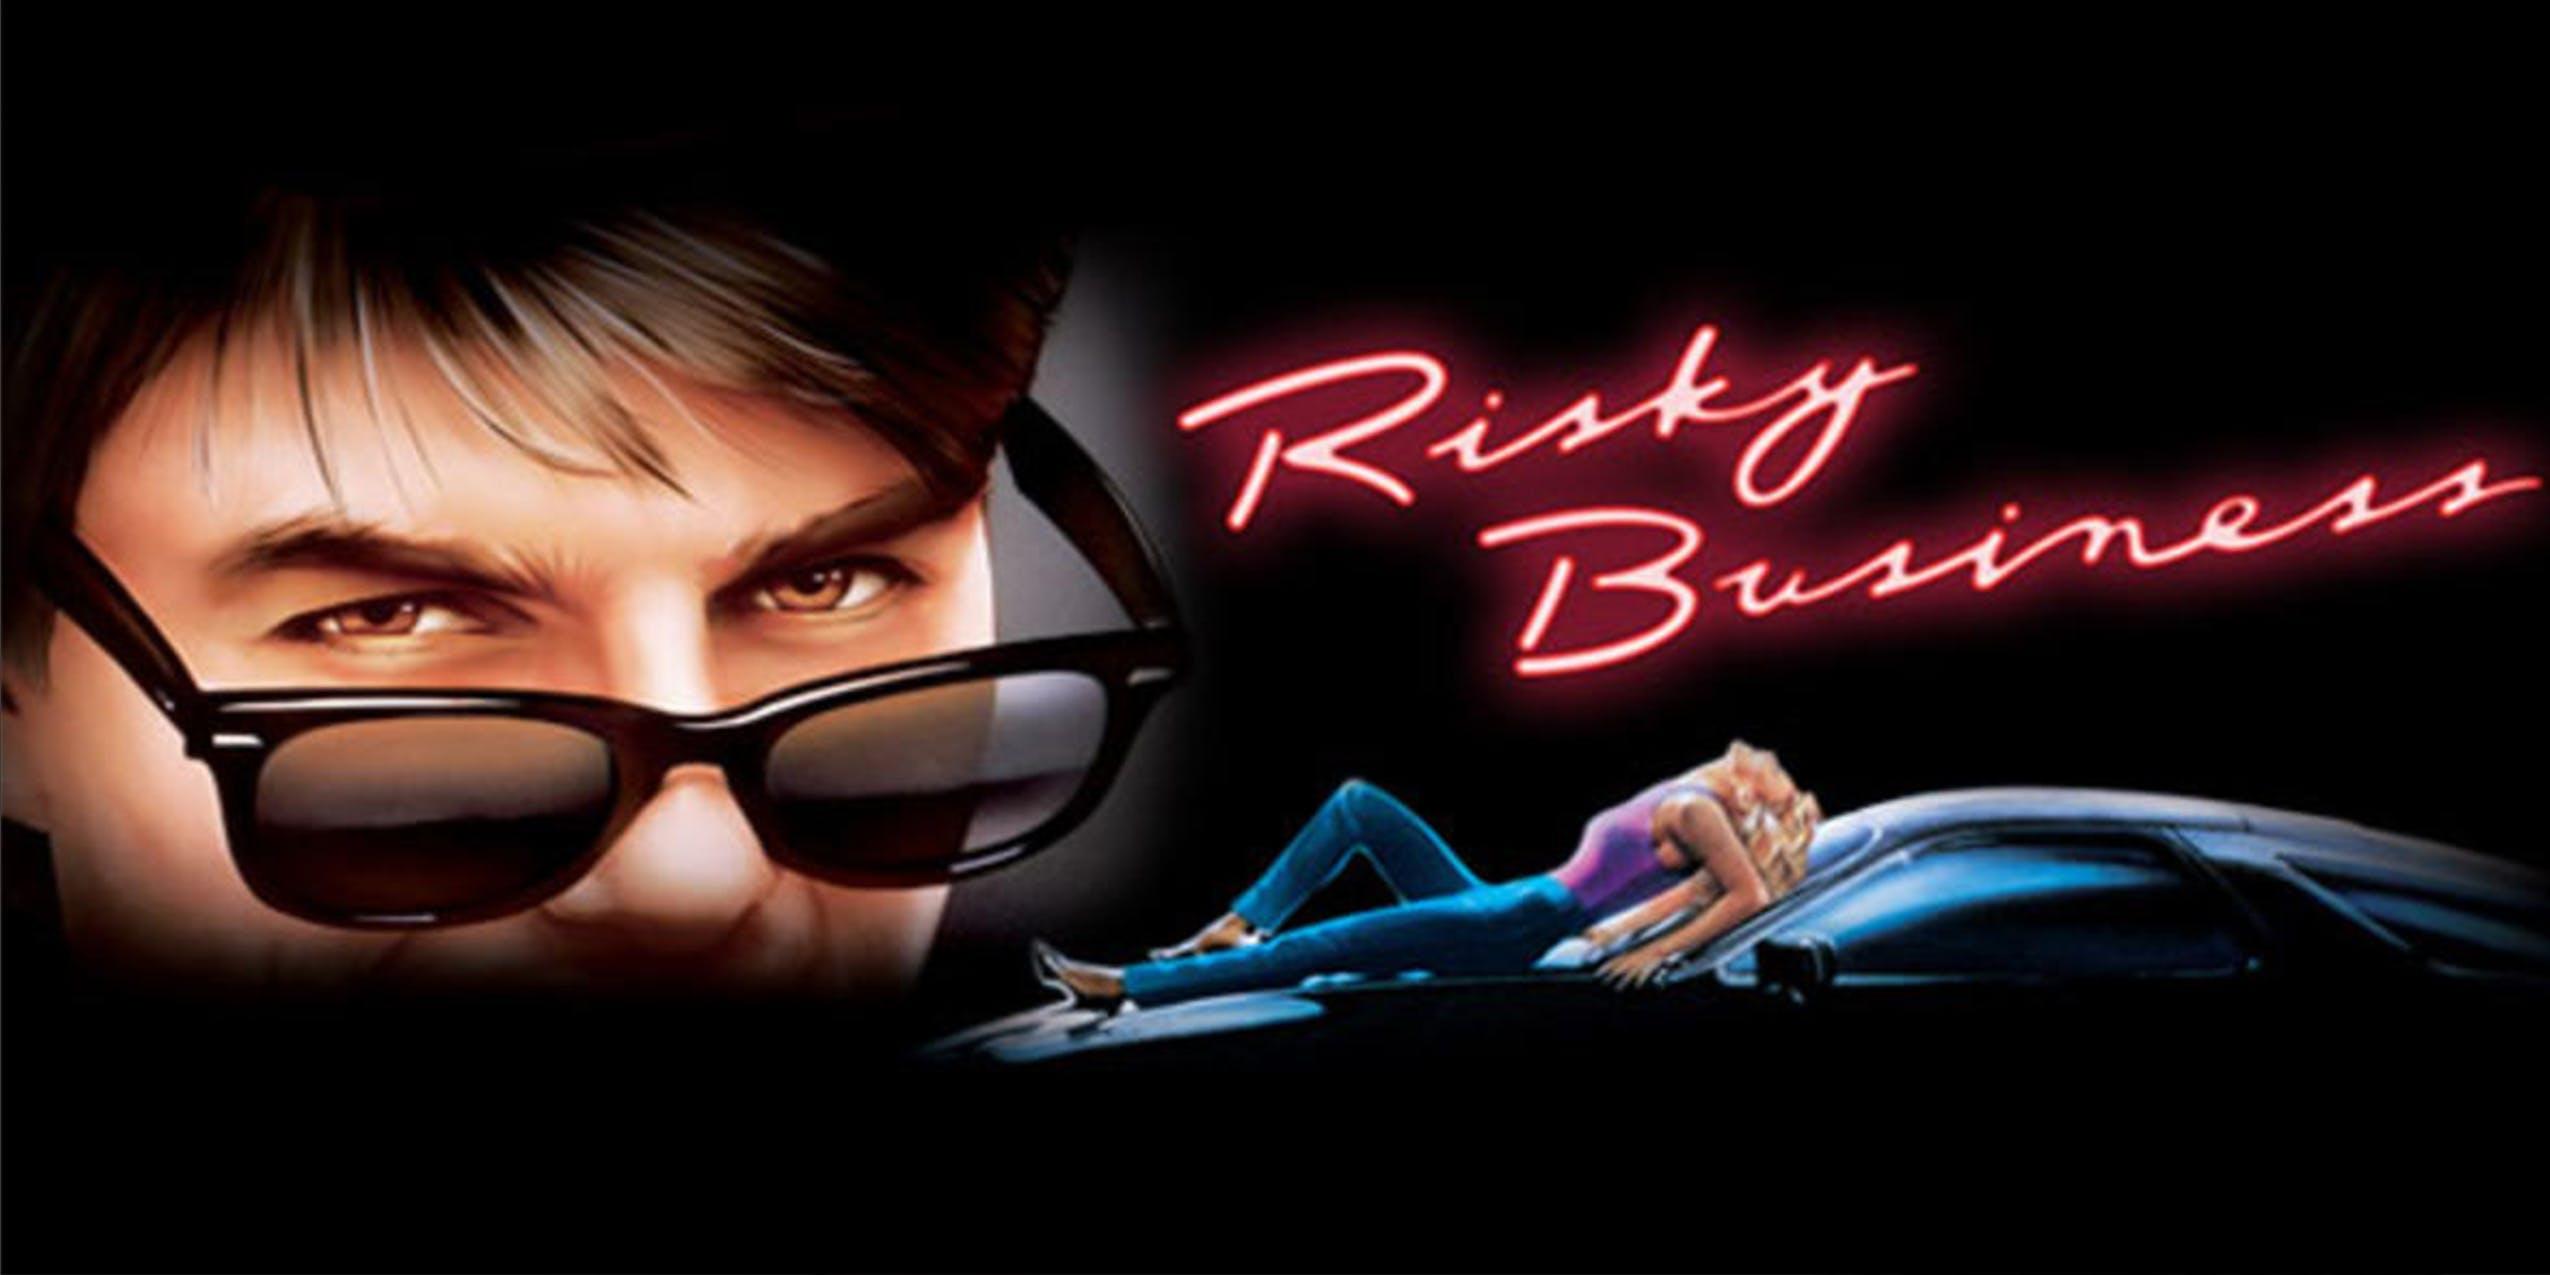 risky business hulu classic movies